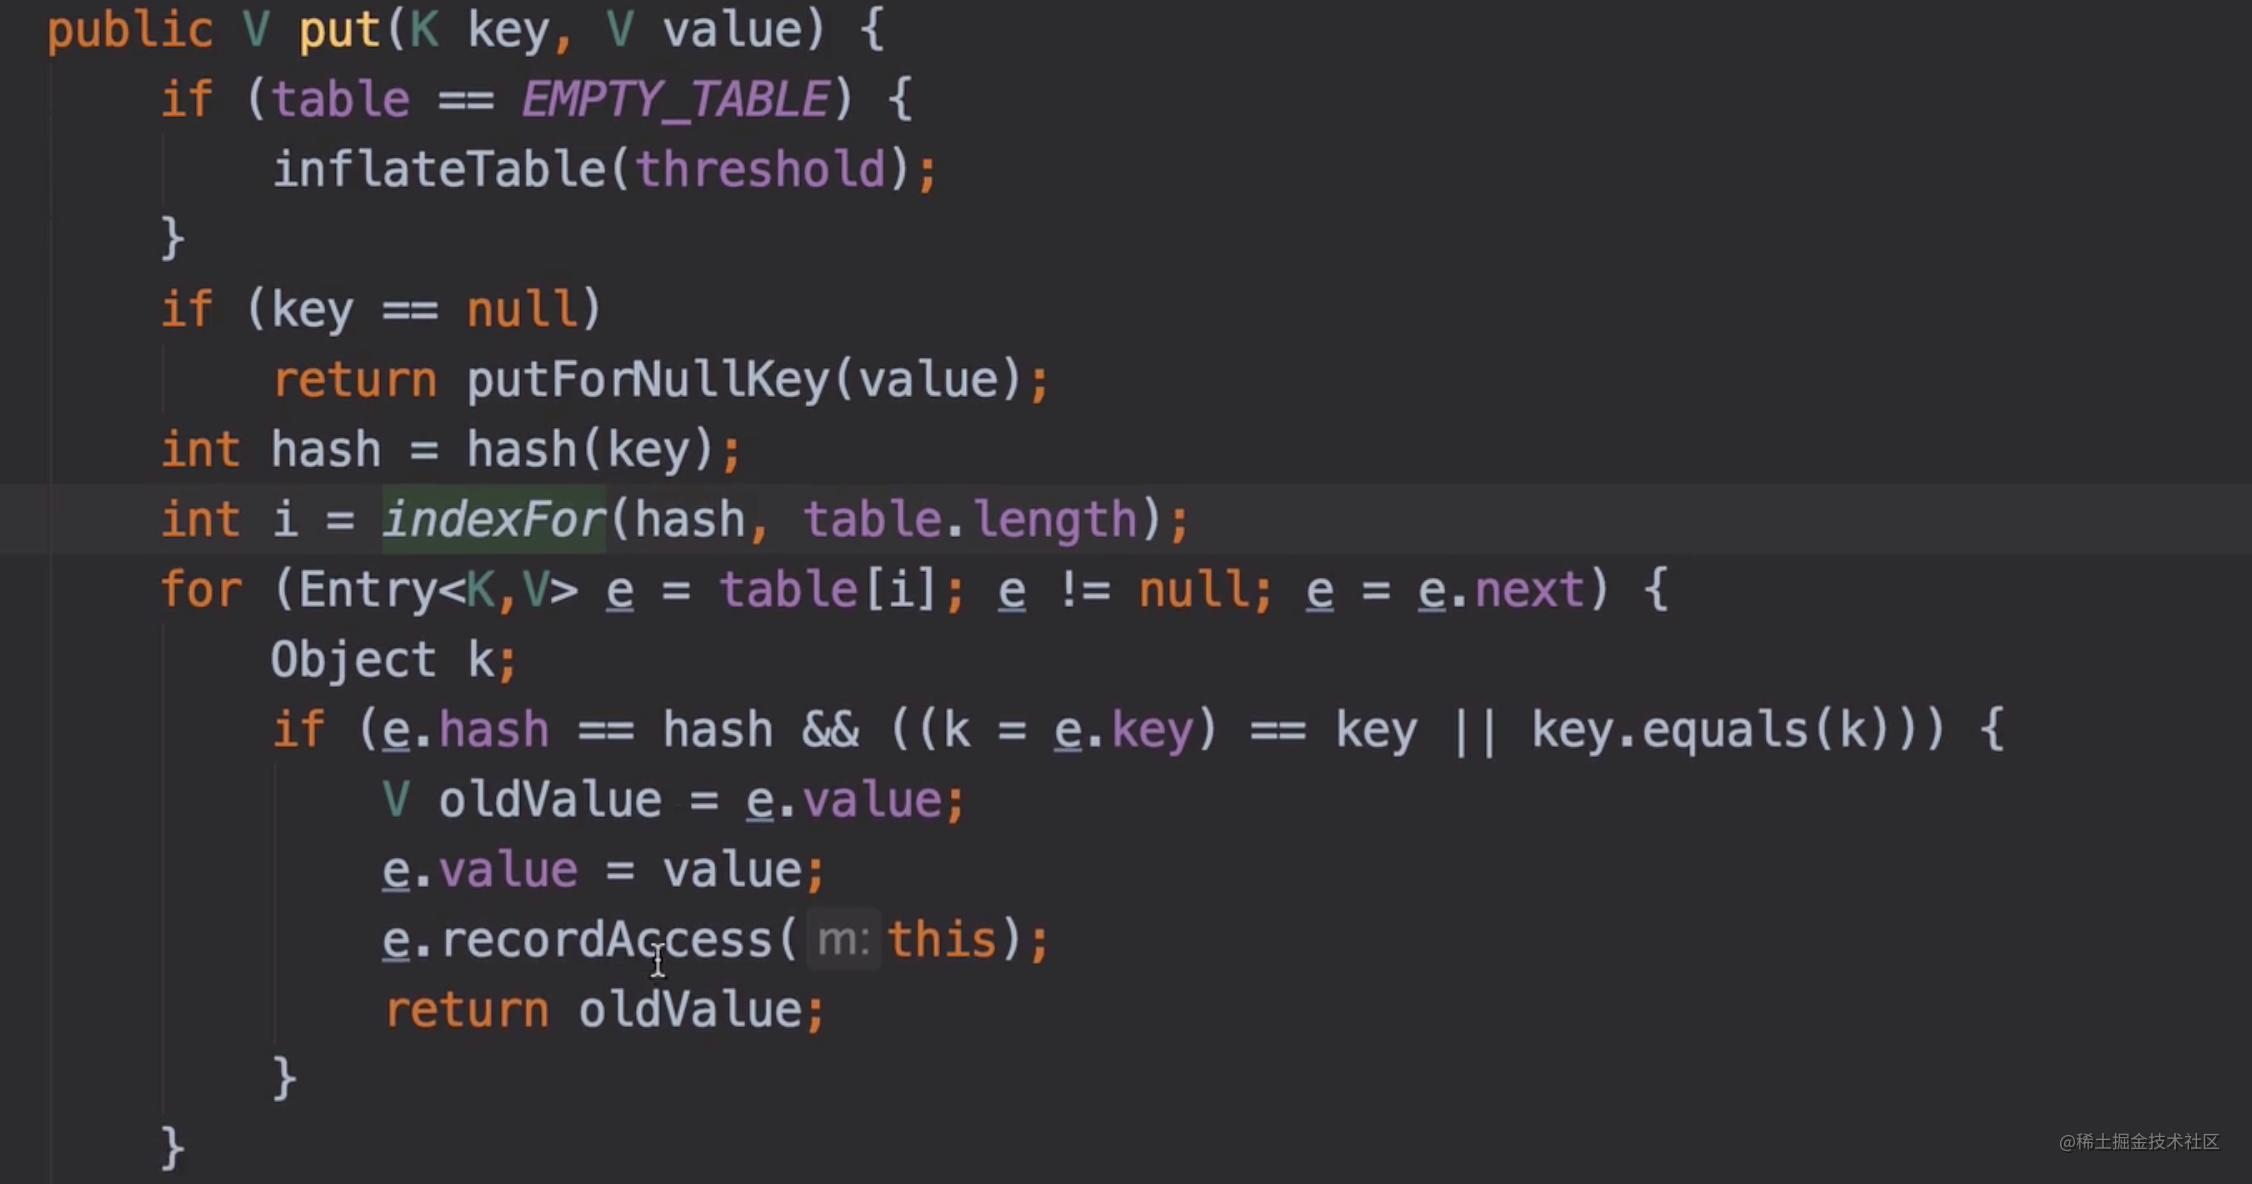 "<img src="""" alt=""2"" style=""width:75%""/>"